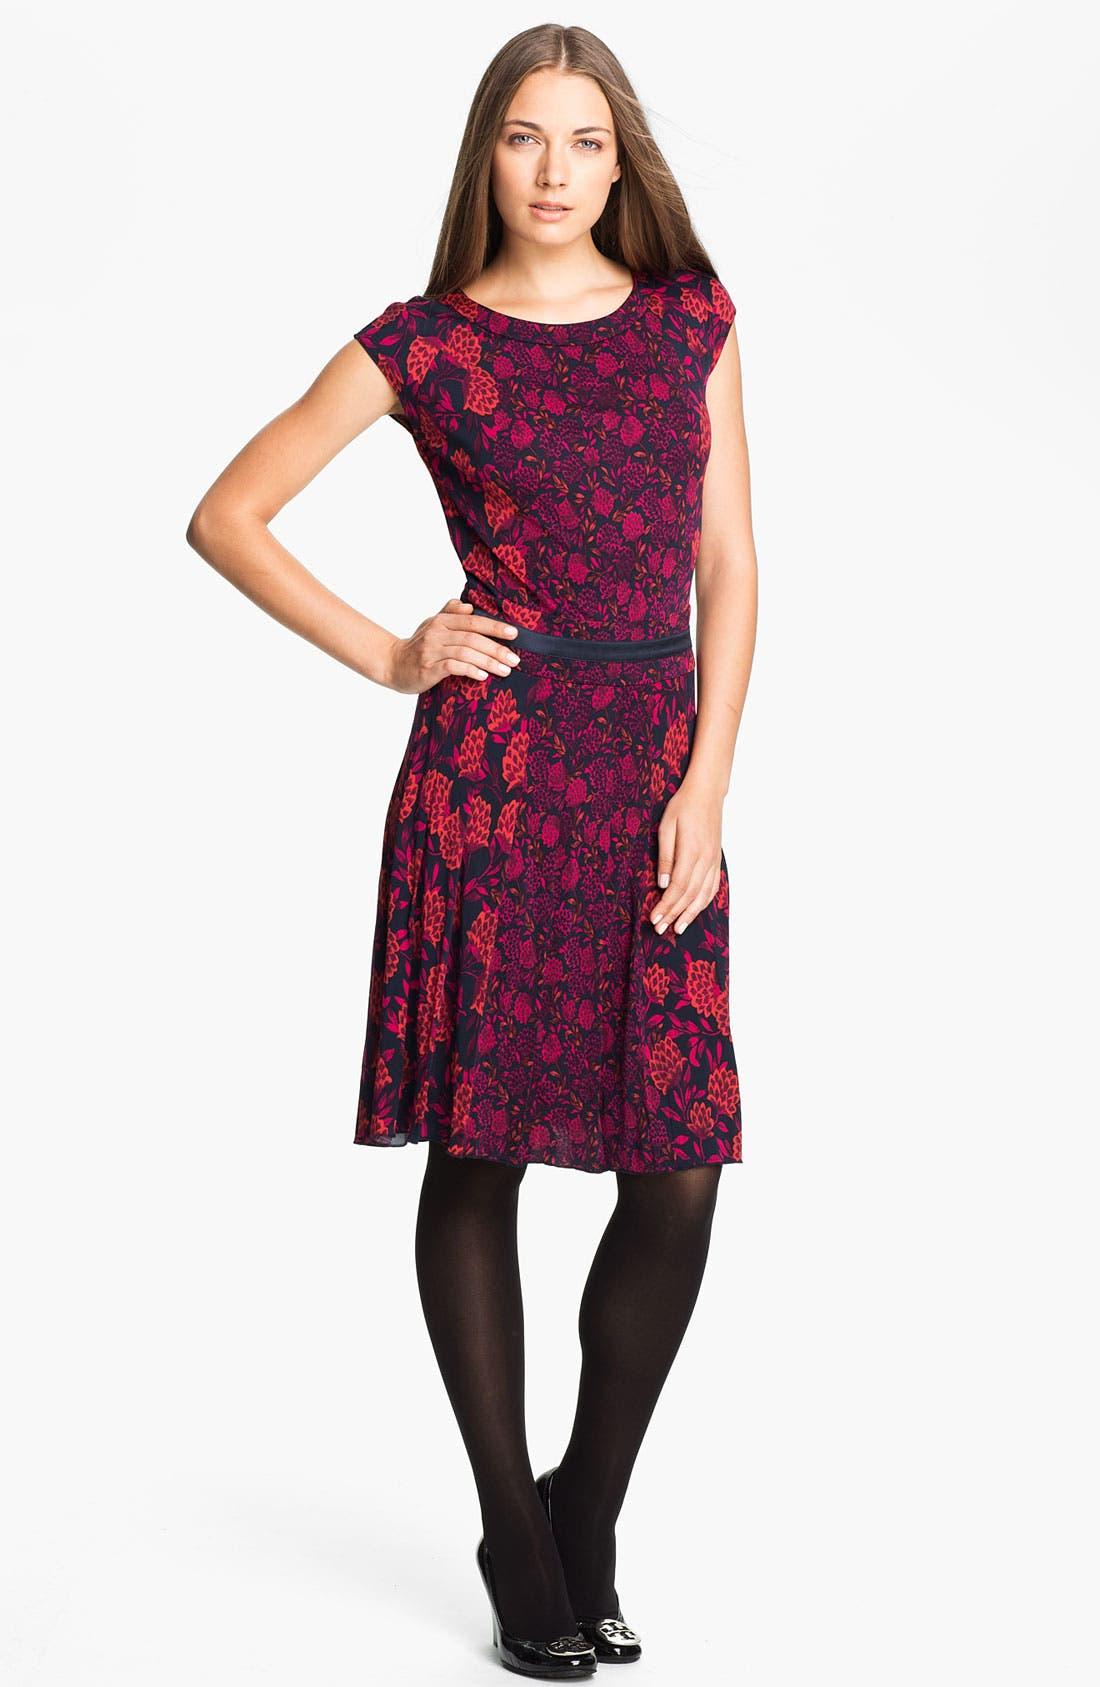 Alternate Image 1 Selected - Tory Burch 'Tamia' Print Blouson Dress